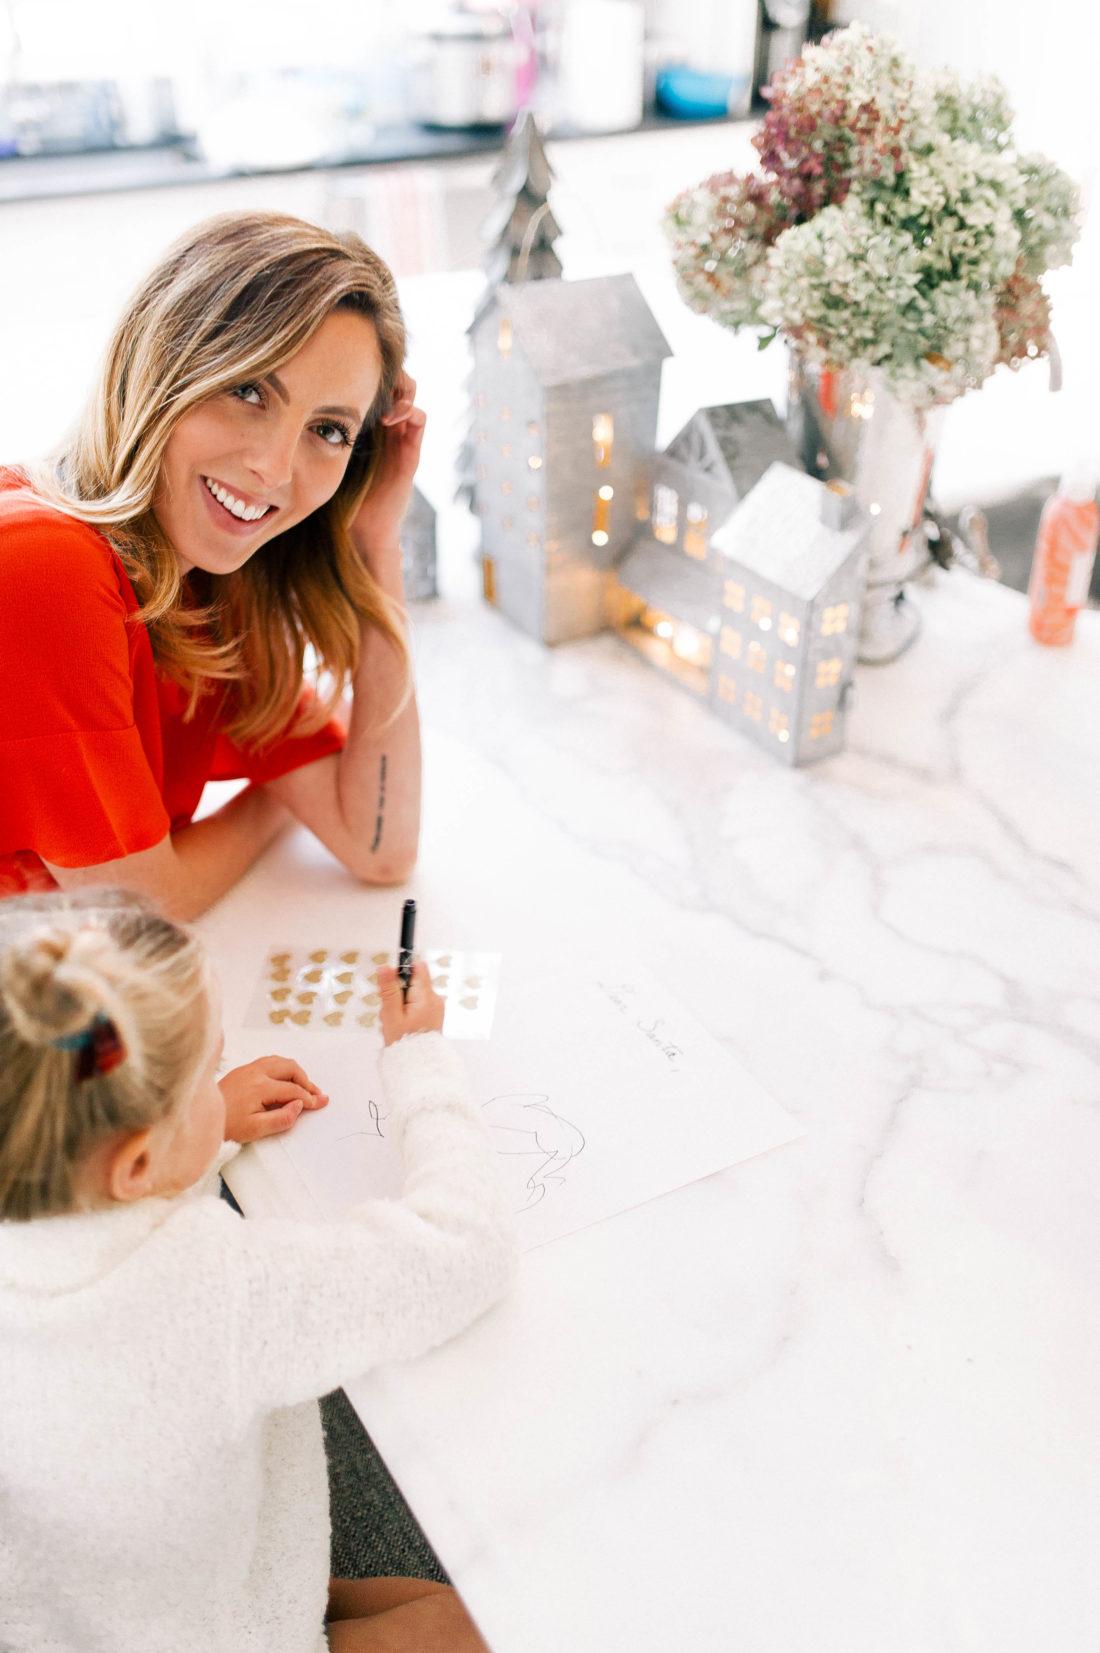 Eva Amurri Martino helps three year old daughter, Marlowe write a letter to santa